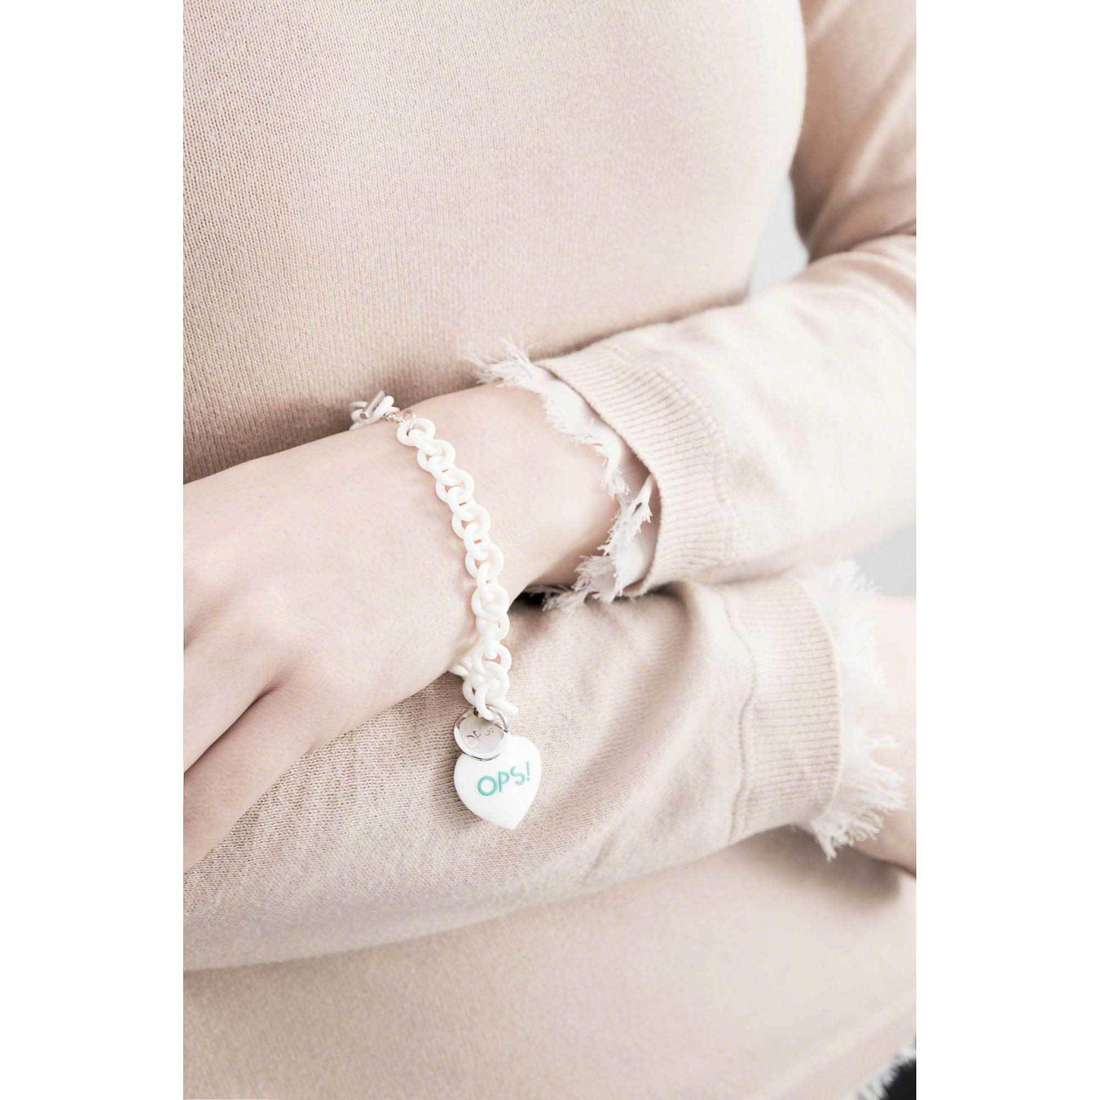 Ops Objects bracciali Cherie donna OPSBR-224 indosso